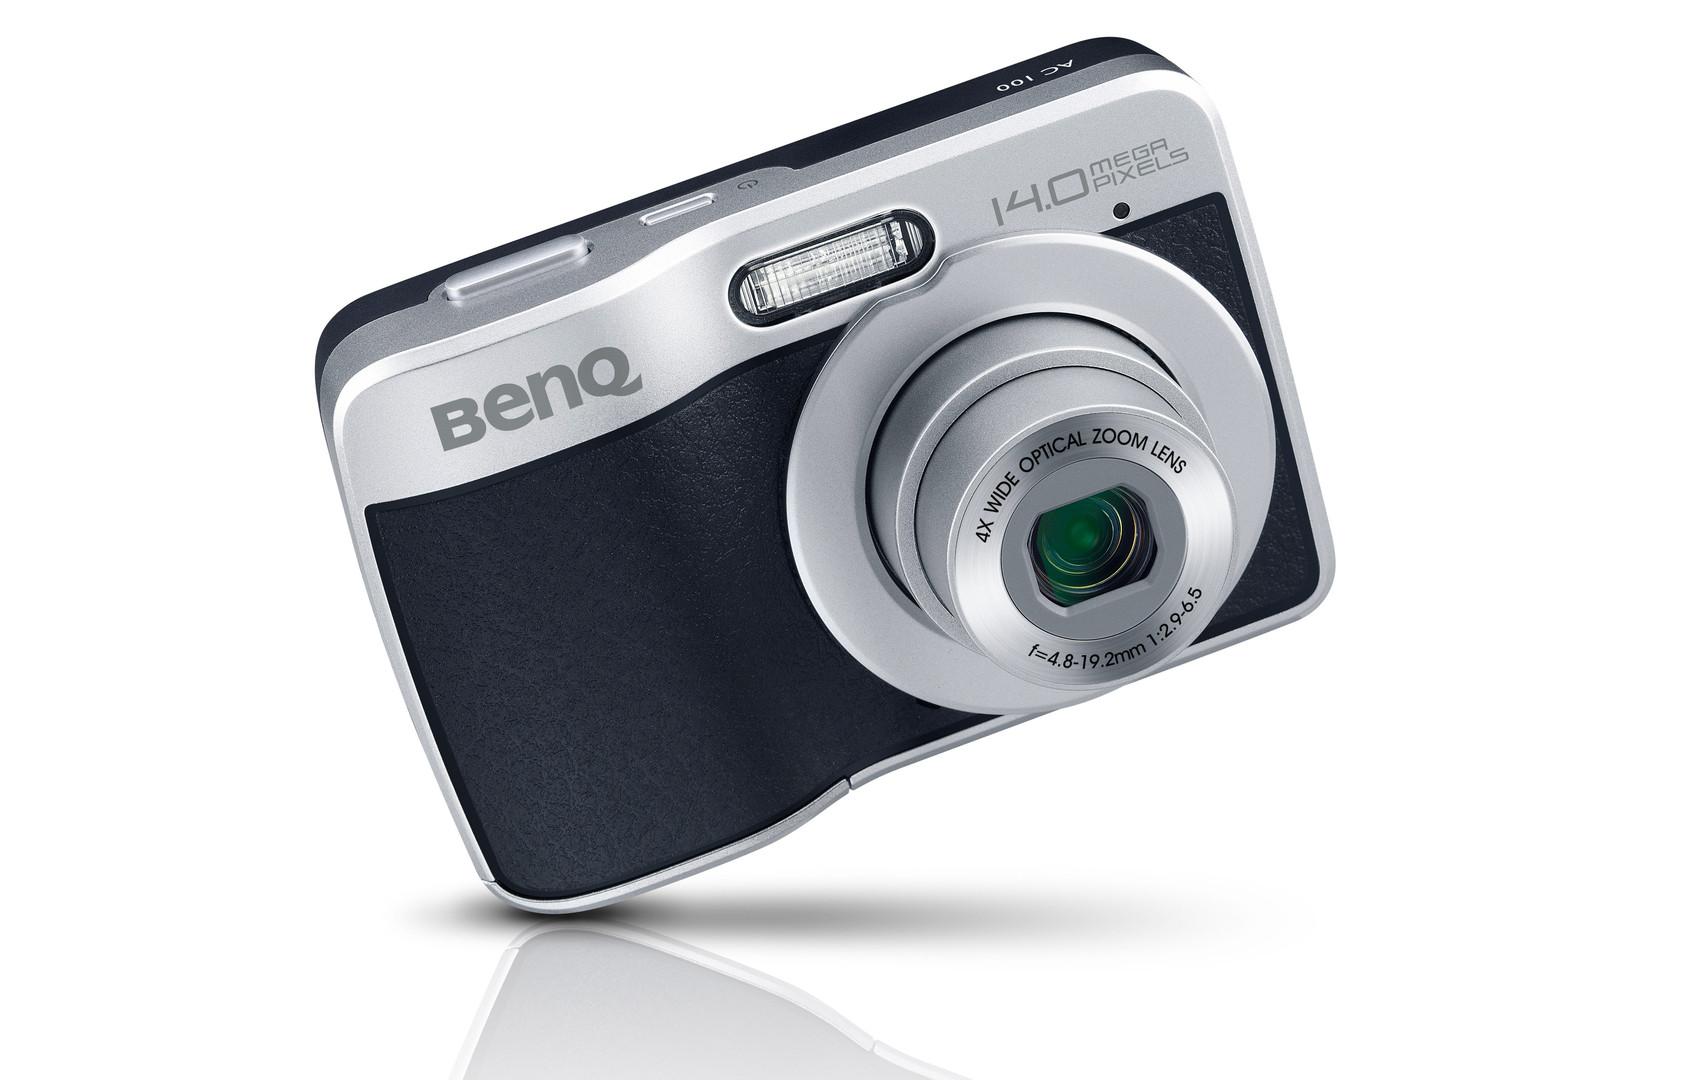 Benq AC100    BenQ Corporation   Фотоаппараты с объективами   Техника #593